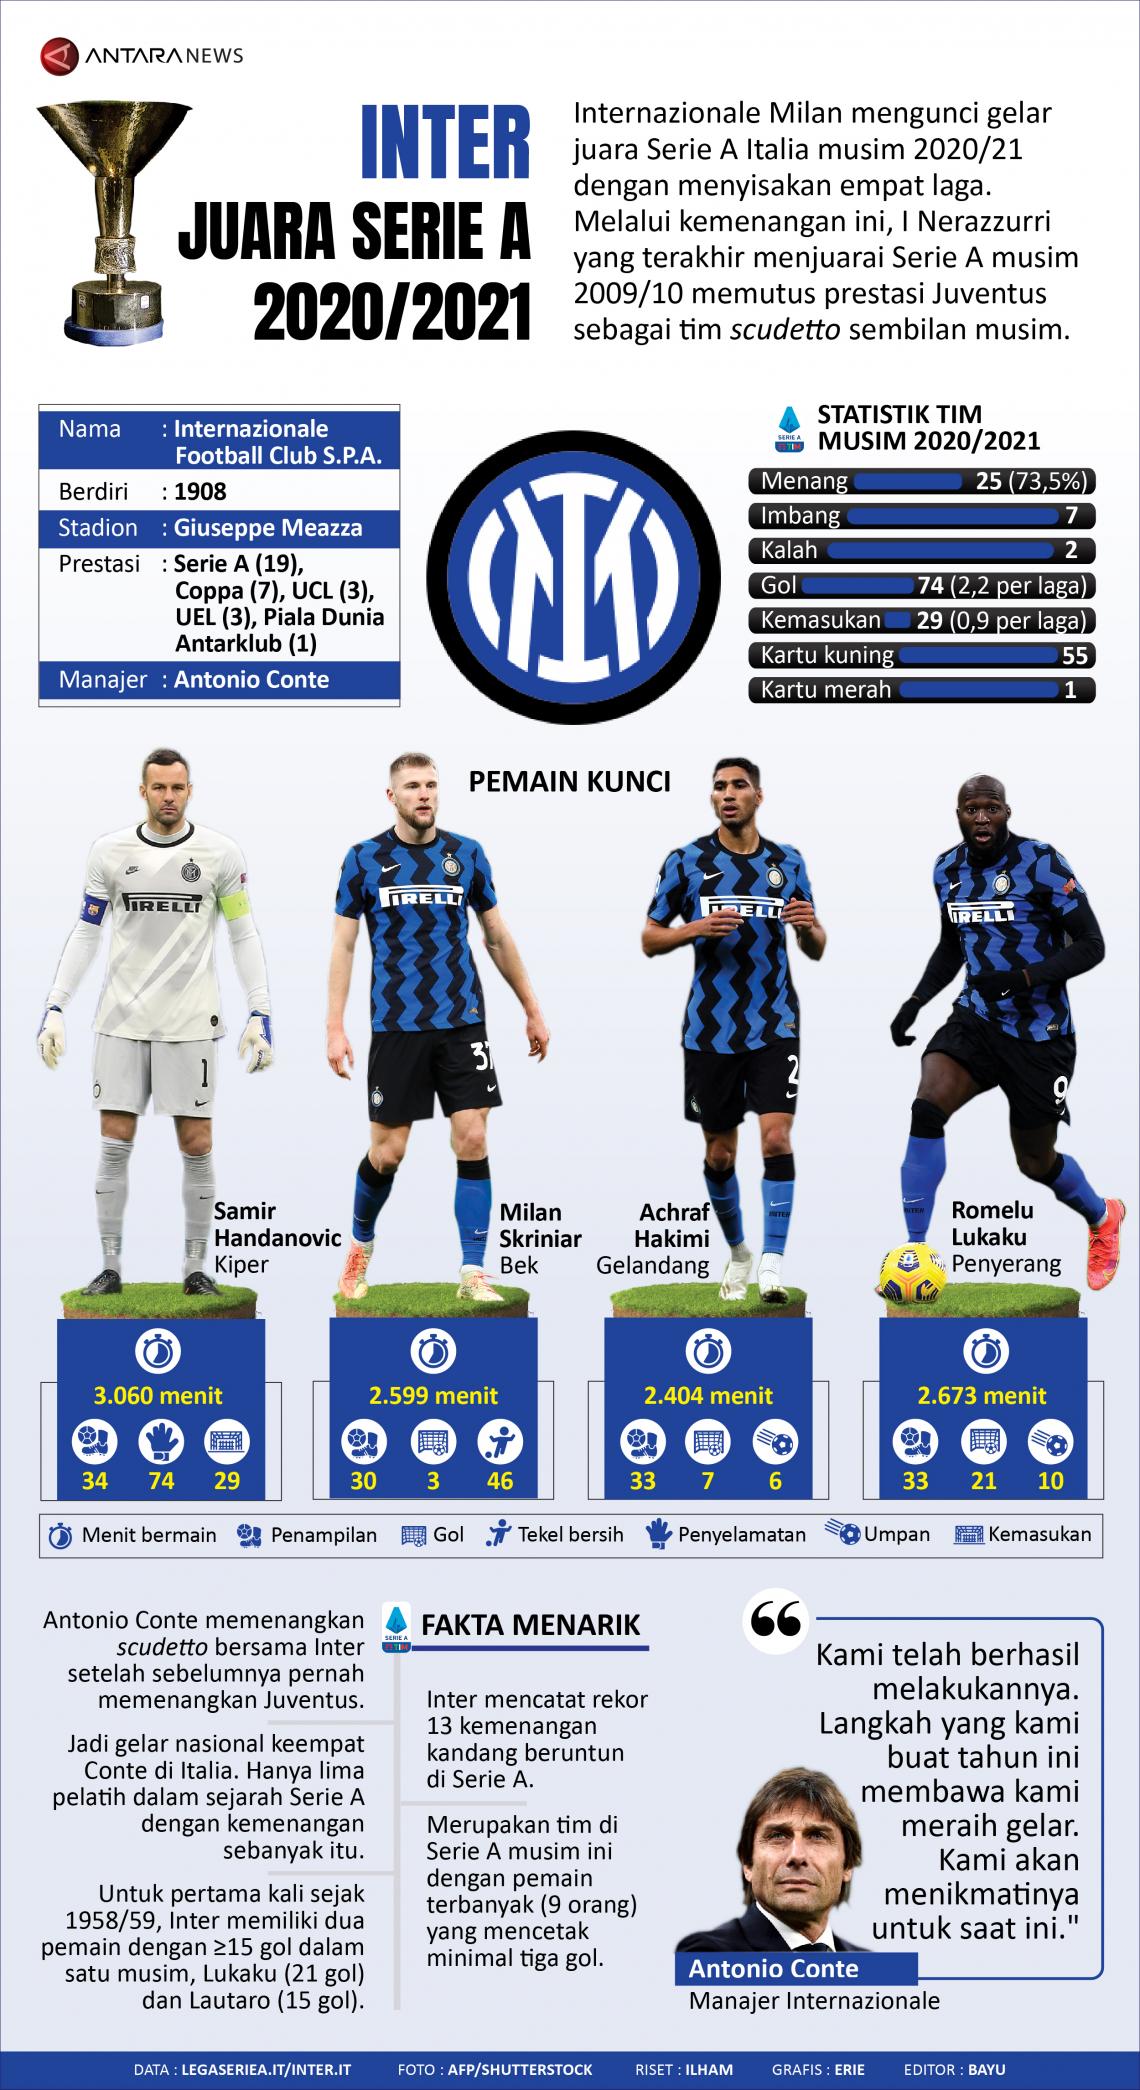 Inter juara Serie A 2020/2021